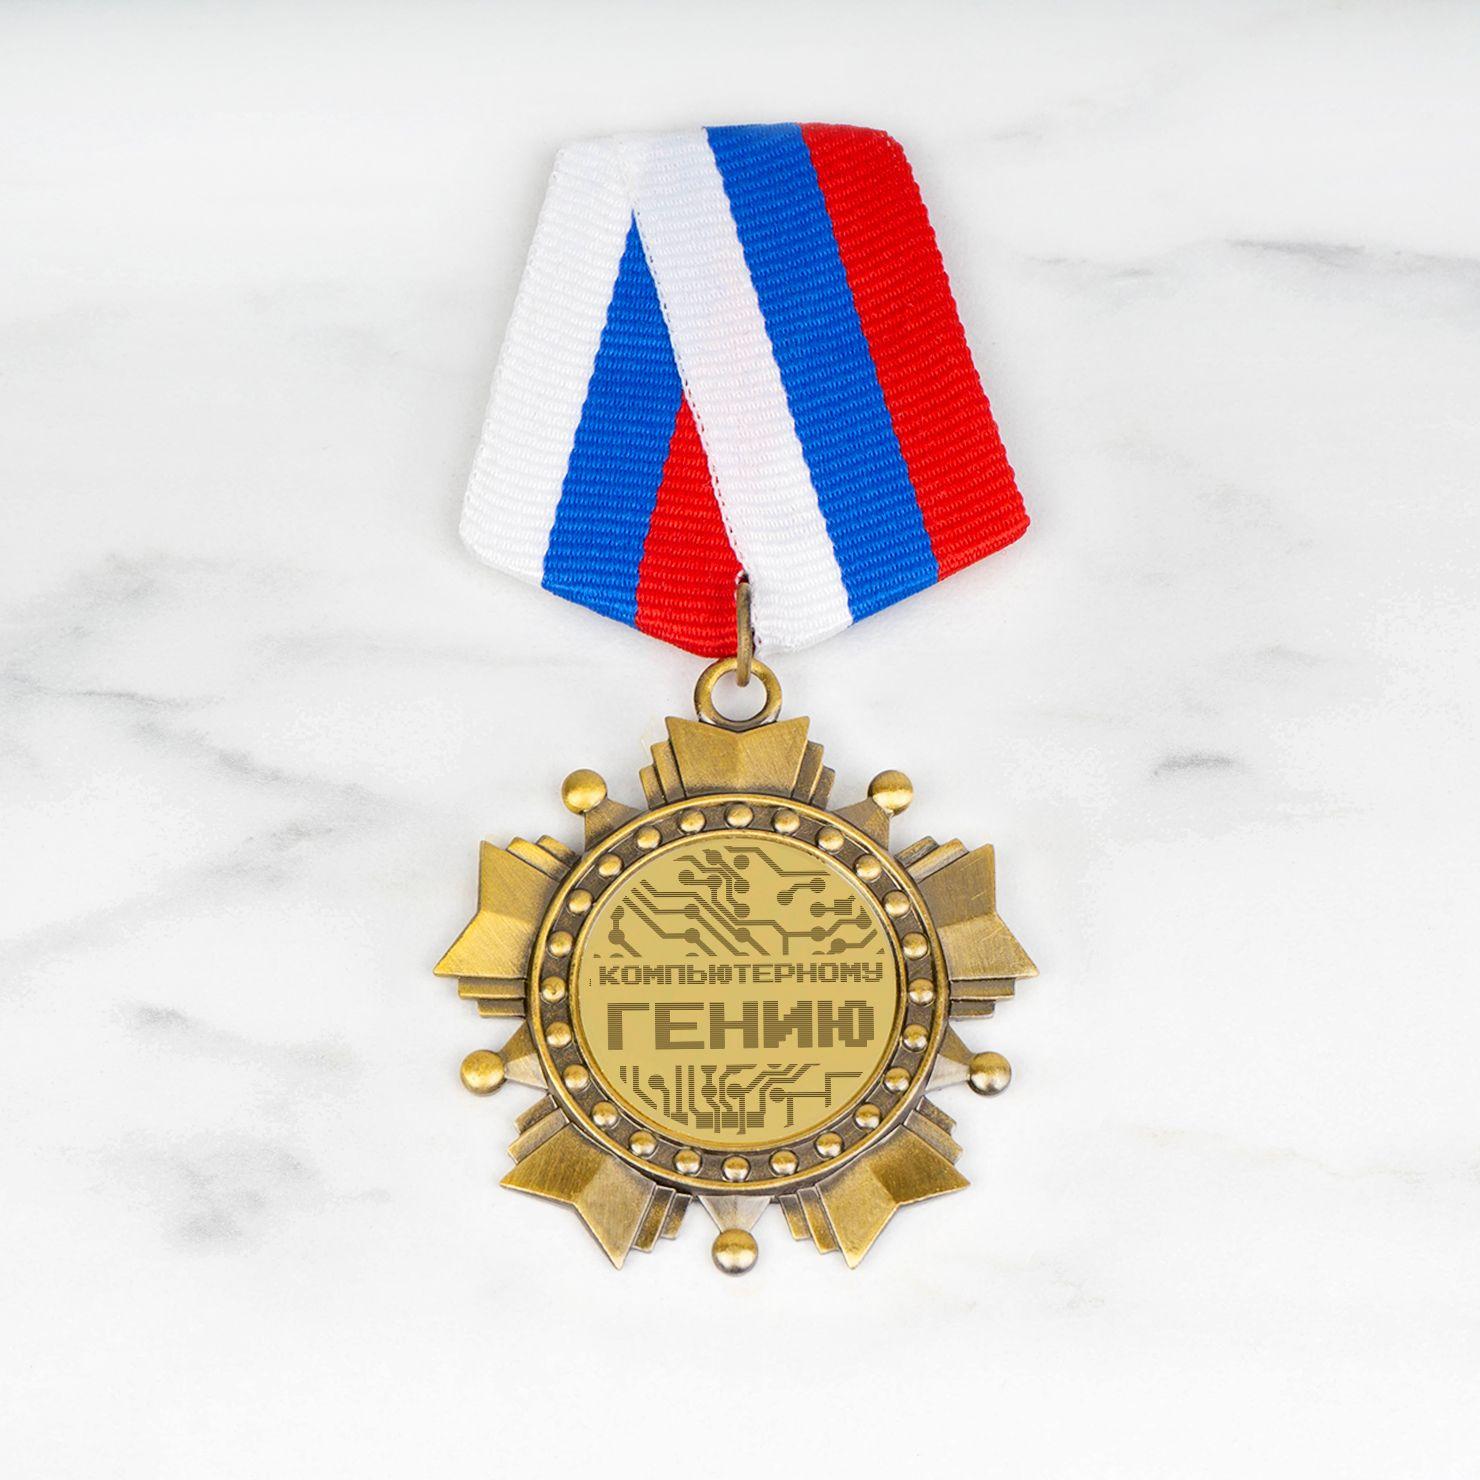 Орден *Компьютерному гению*